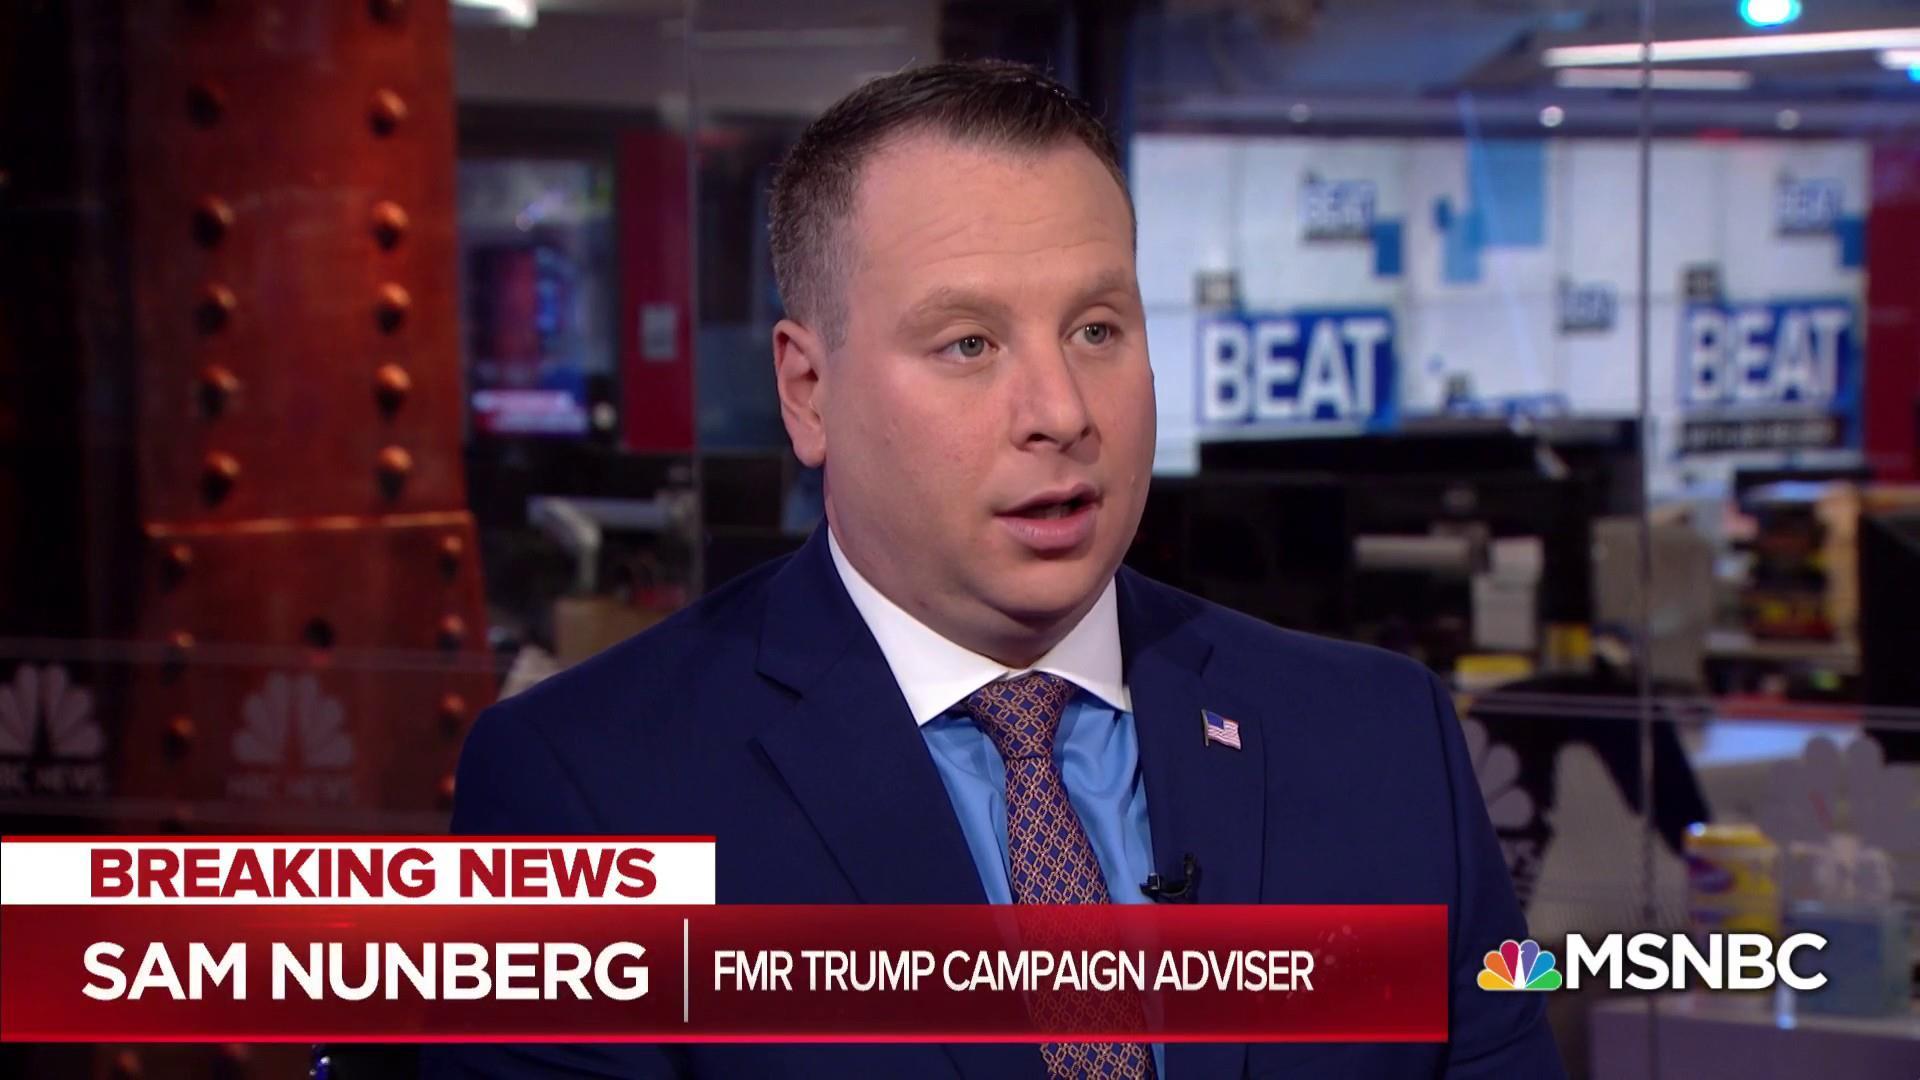 Sam Nunberg explains why Trump aides talk to Trump via TV